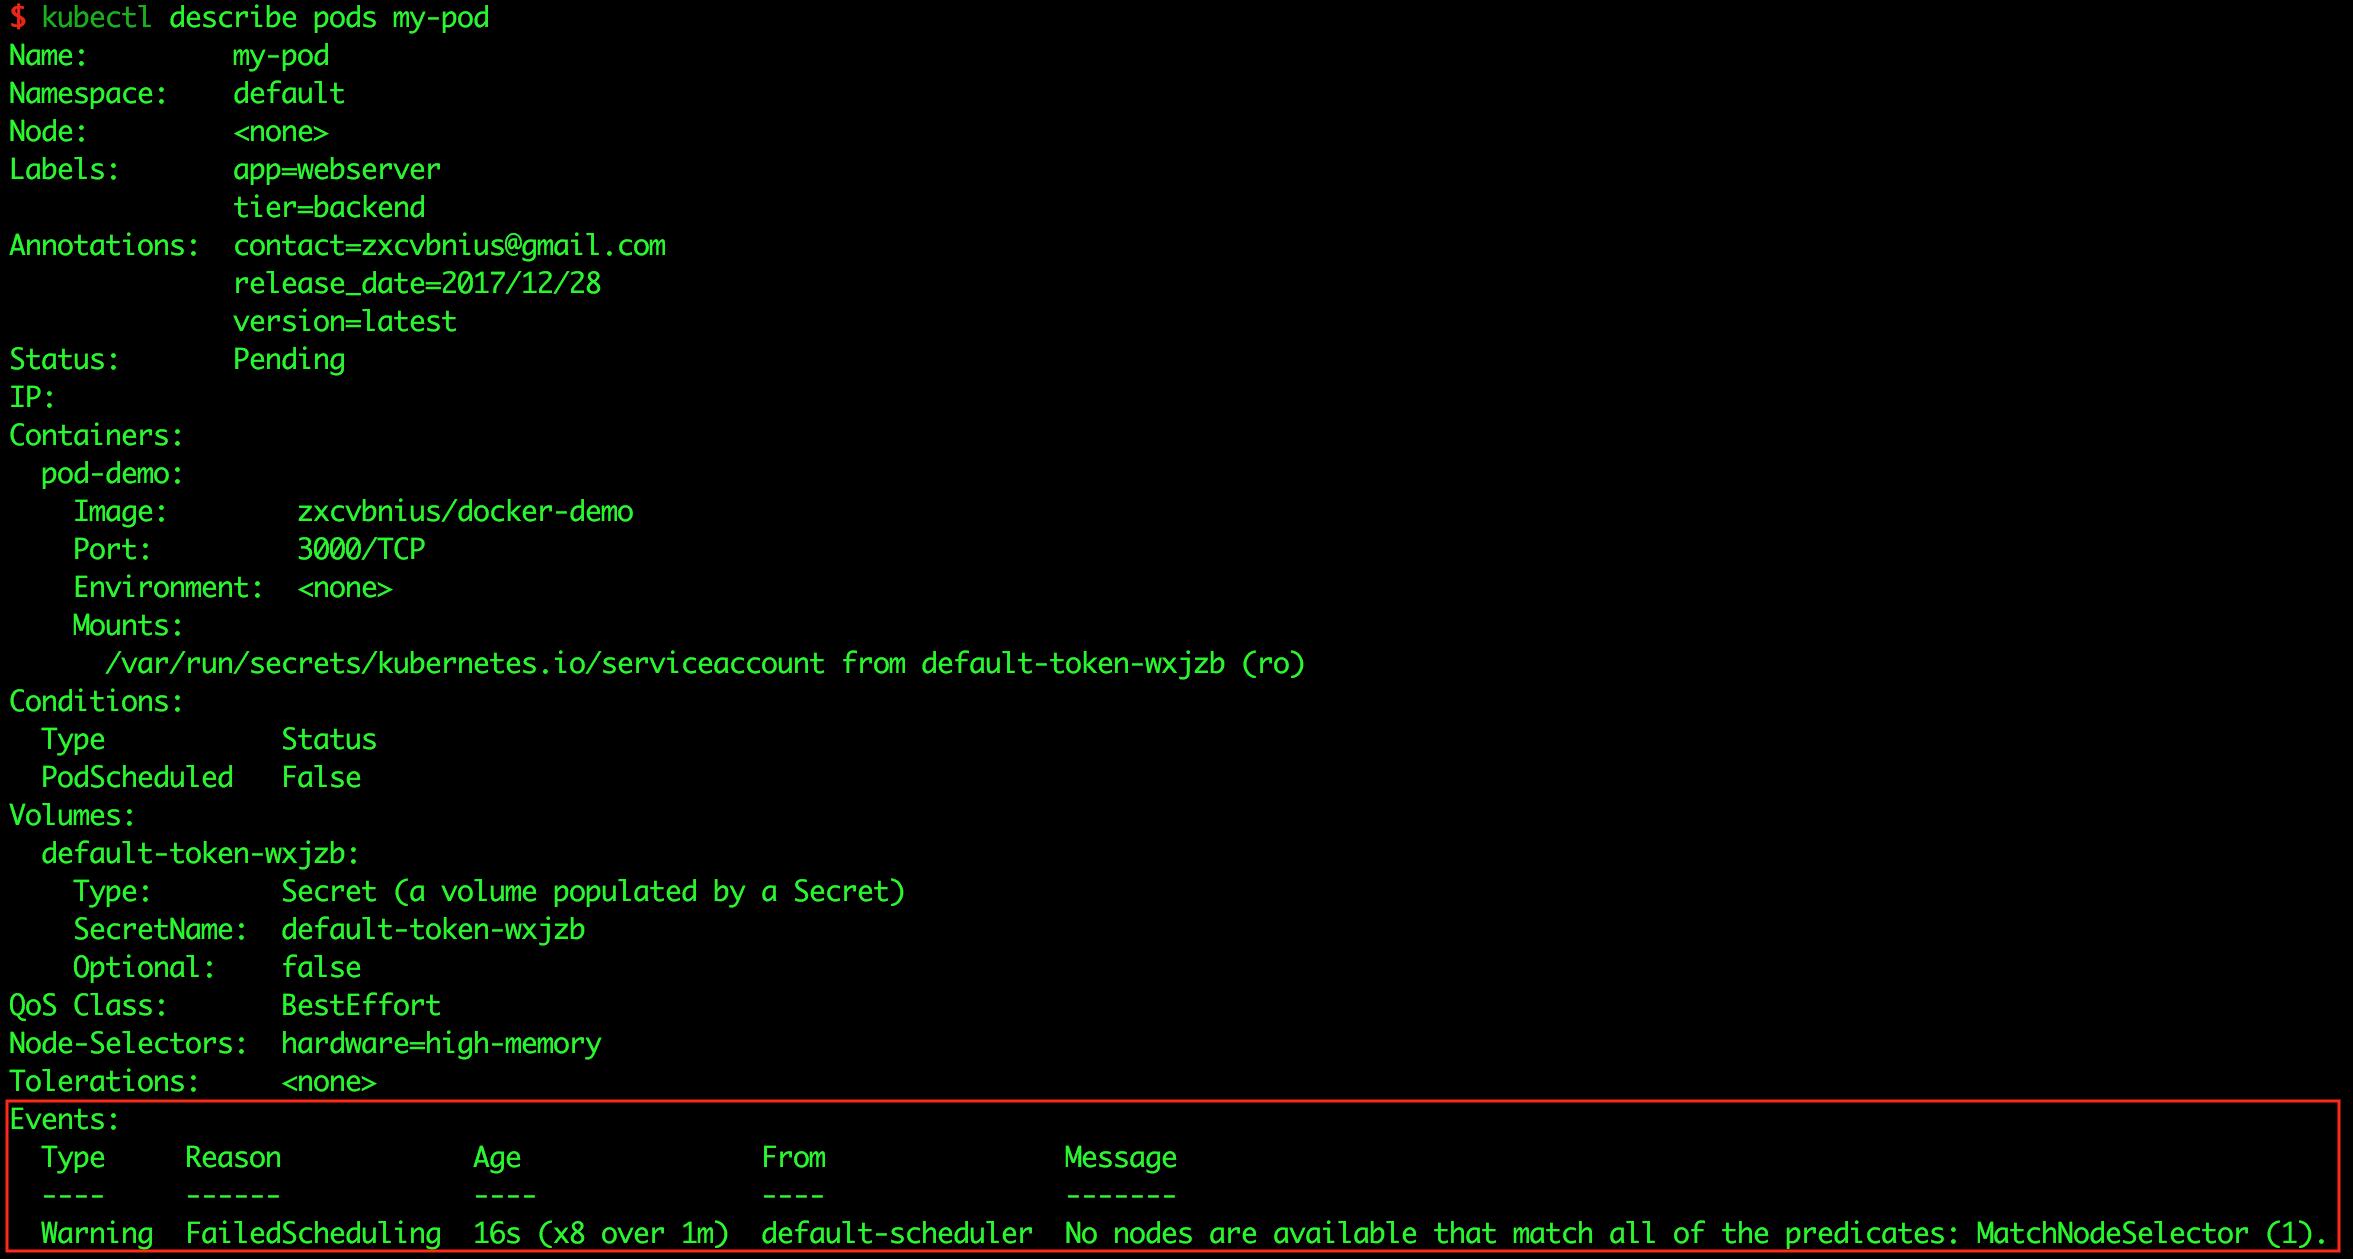 kubectl-describe-pod-with-wrong-node-selector